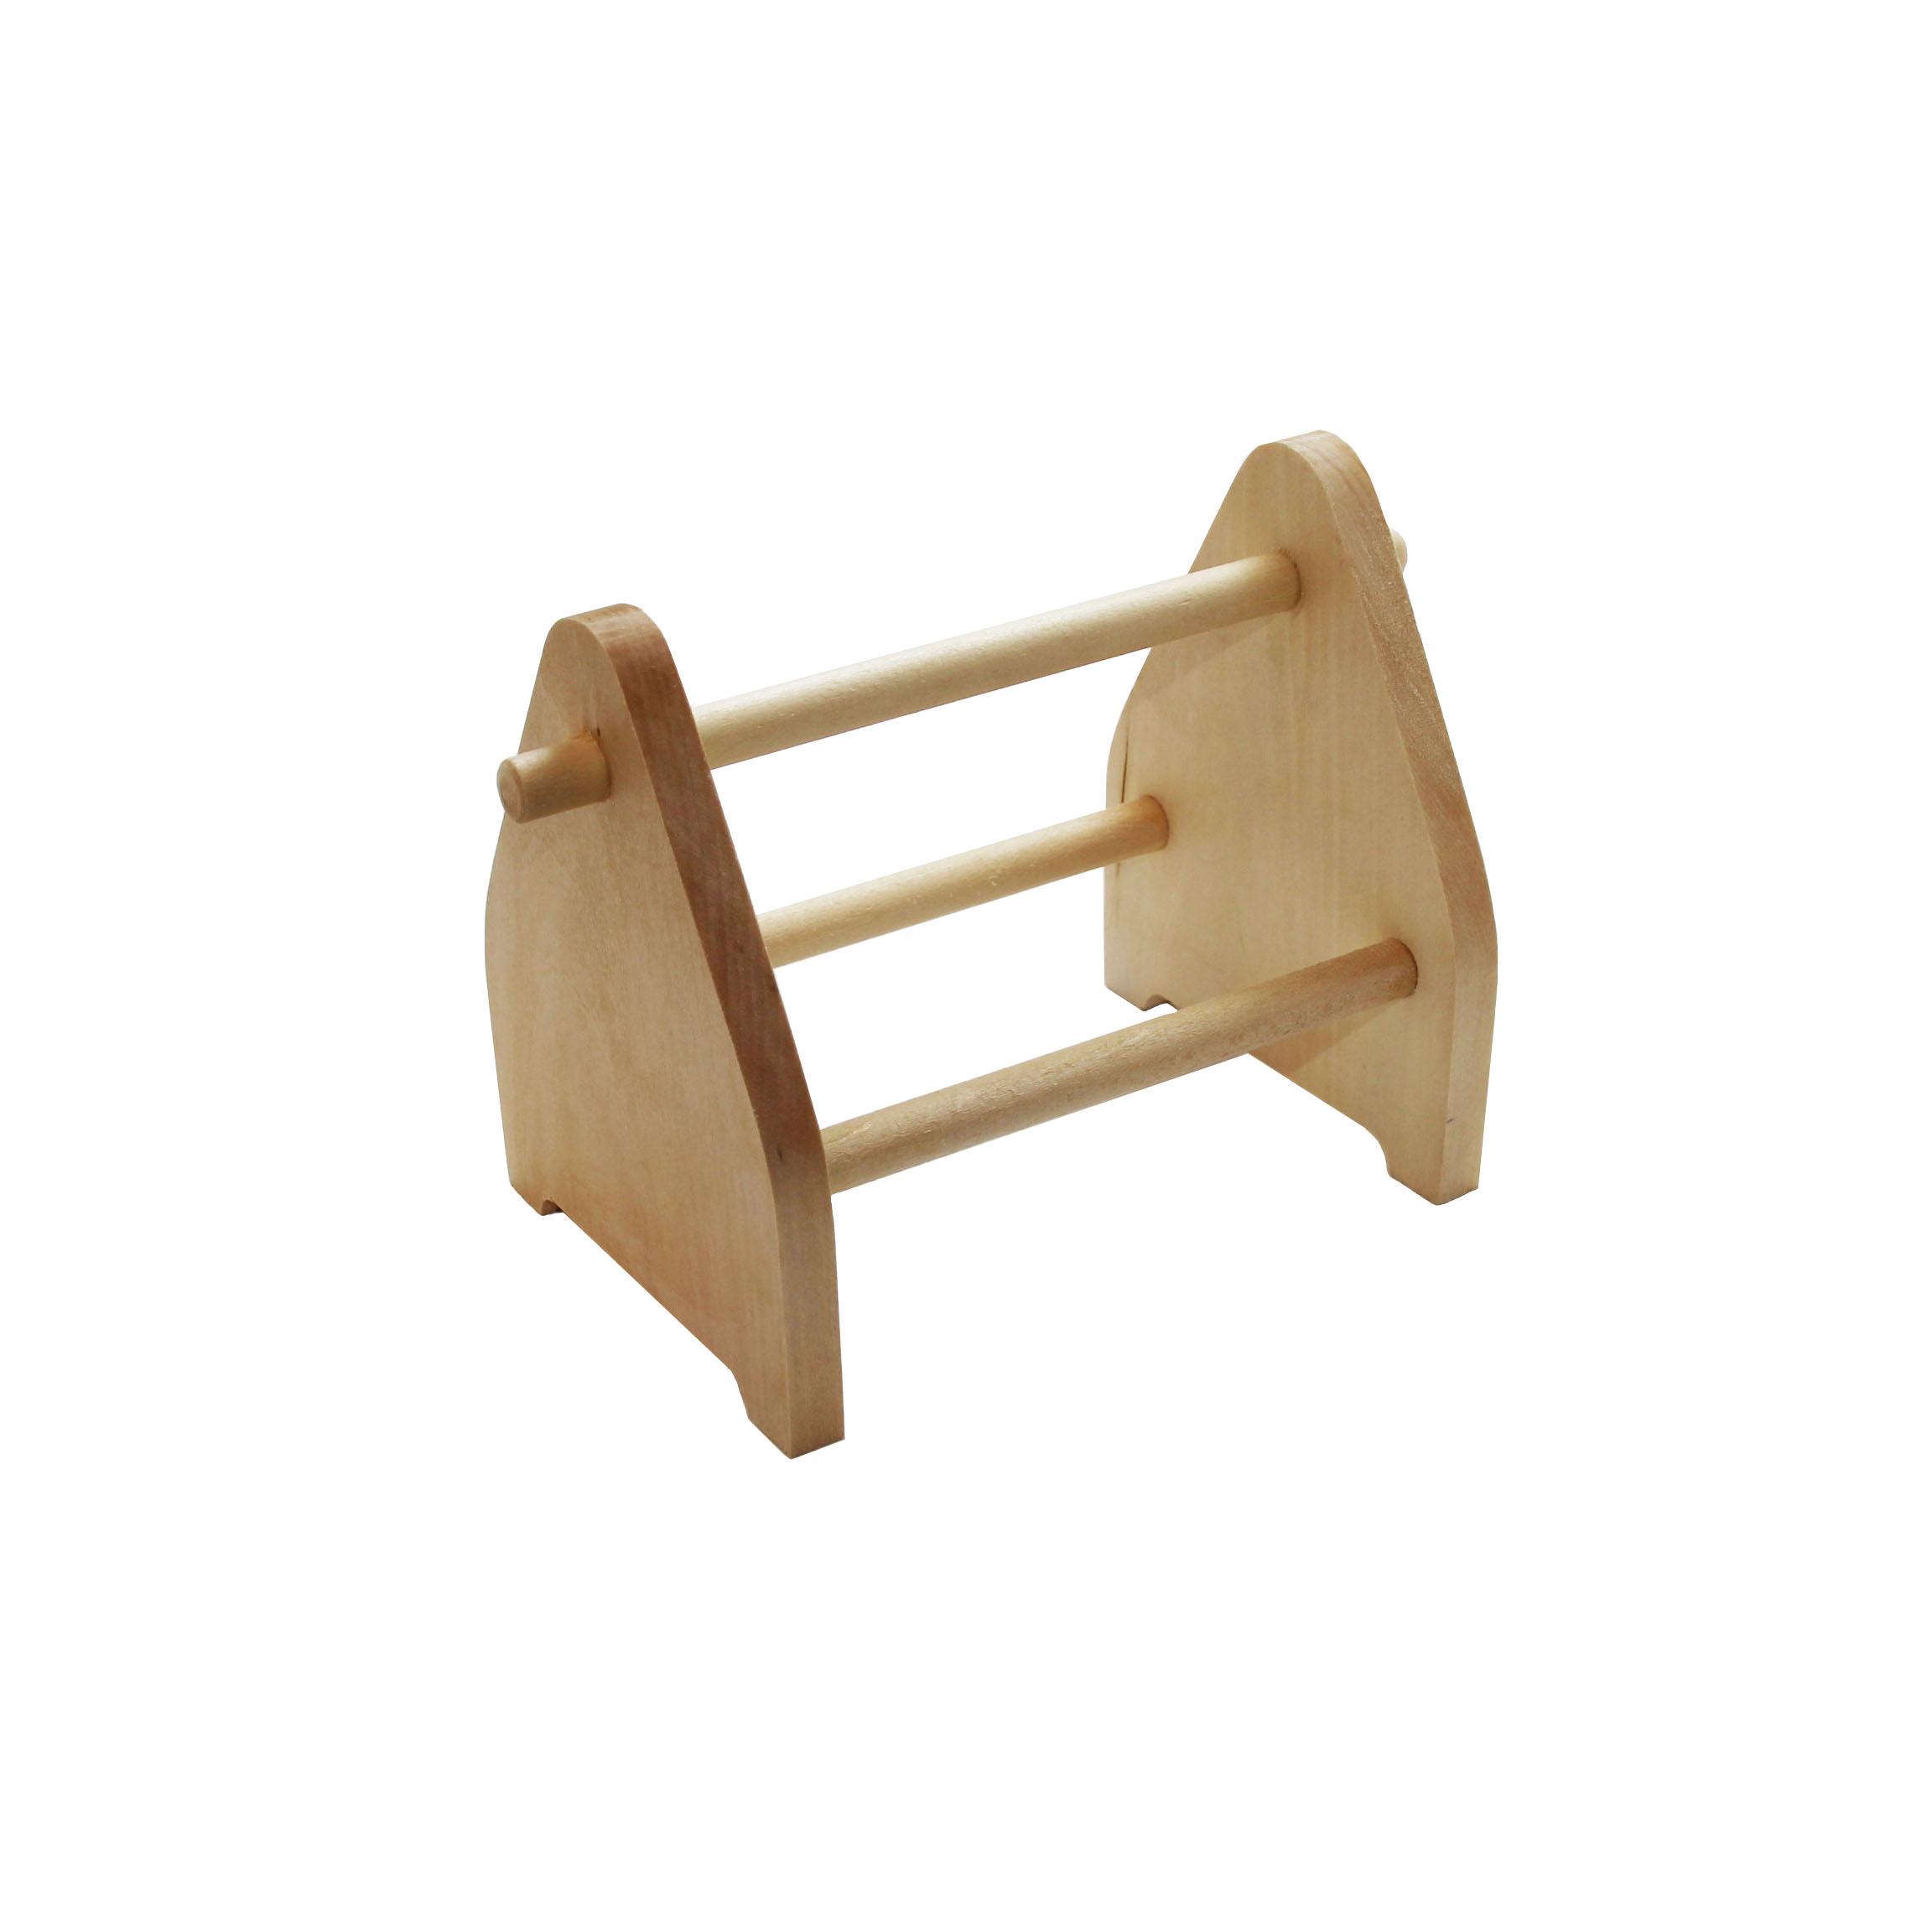 Подставка деревянная для пассатиж. #123